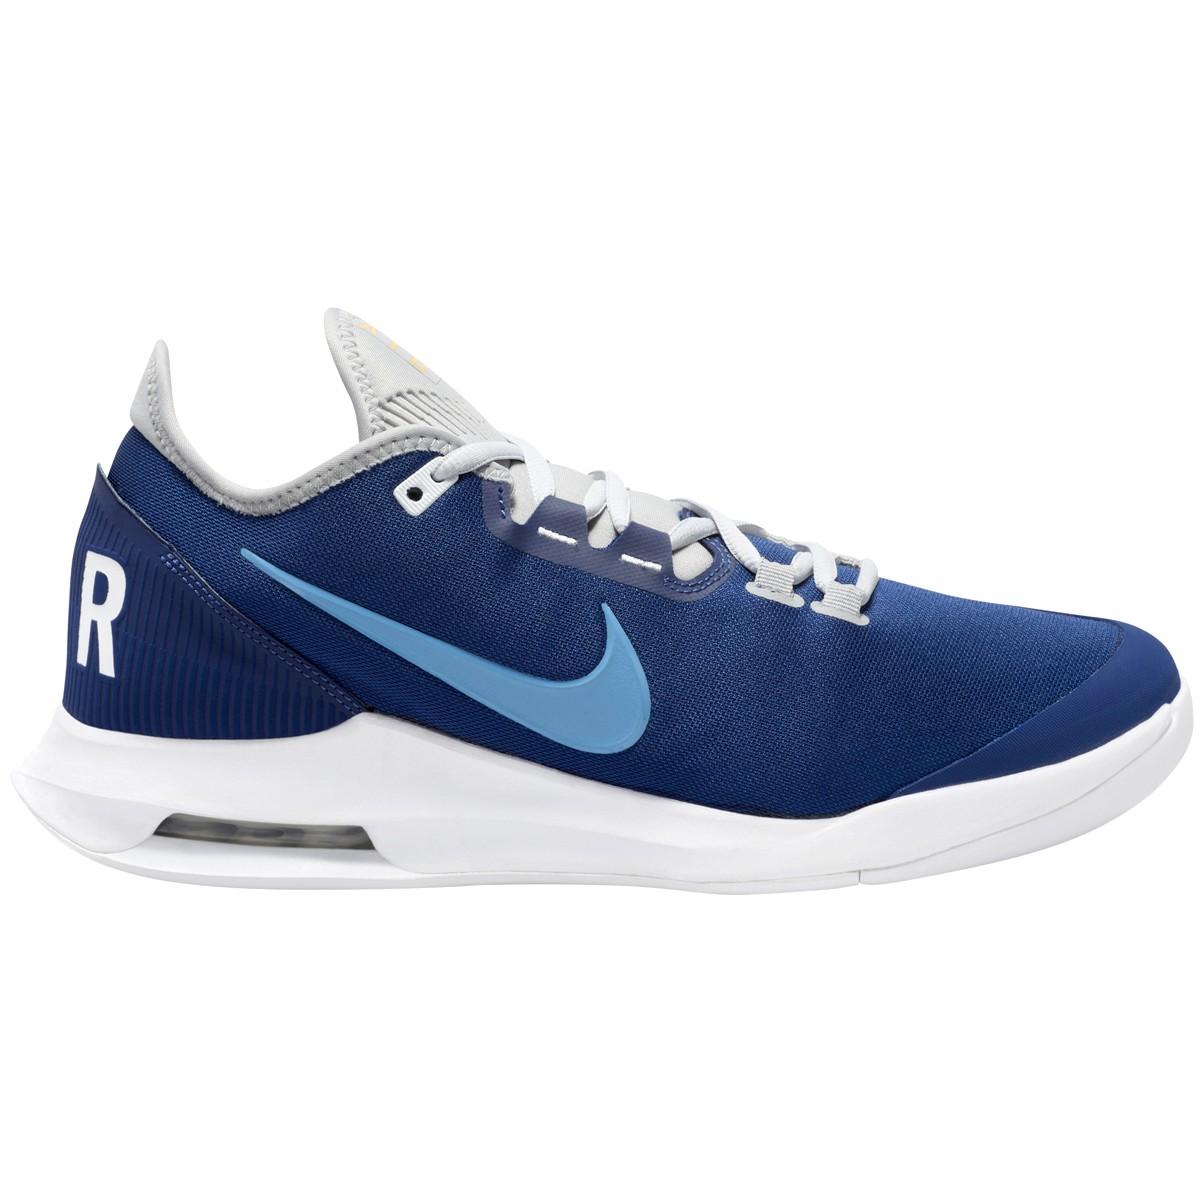 Chaussures Nike Air Max Wildcard Toutes Surfaces